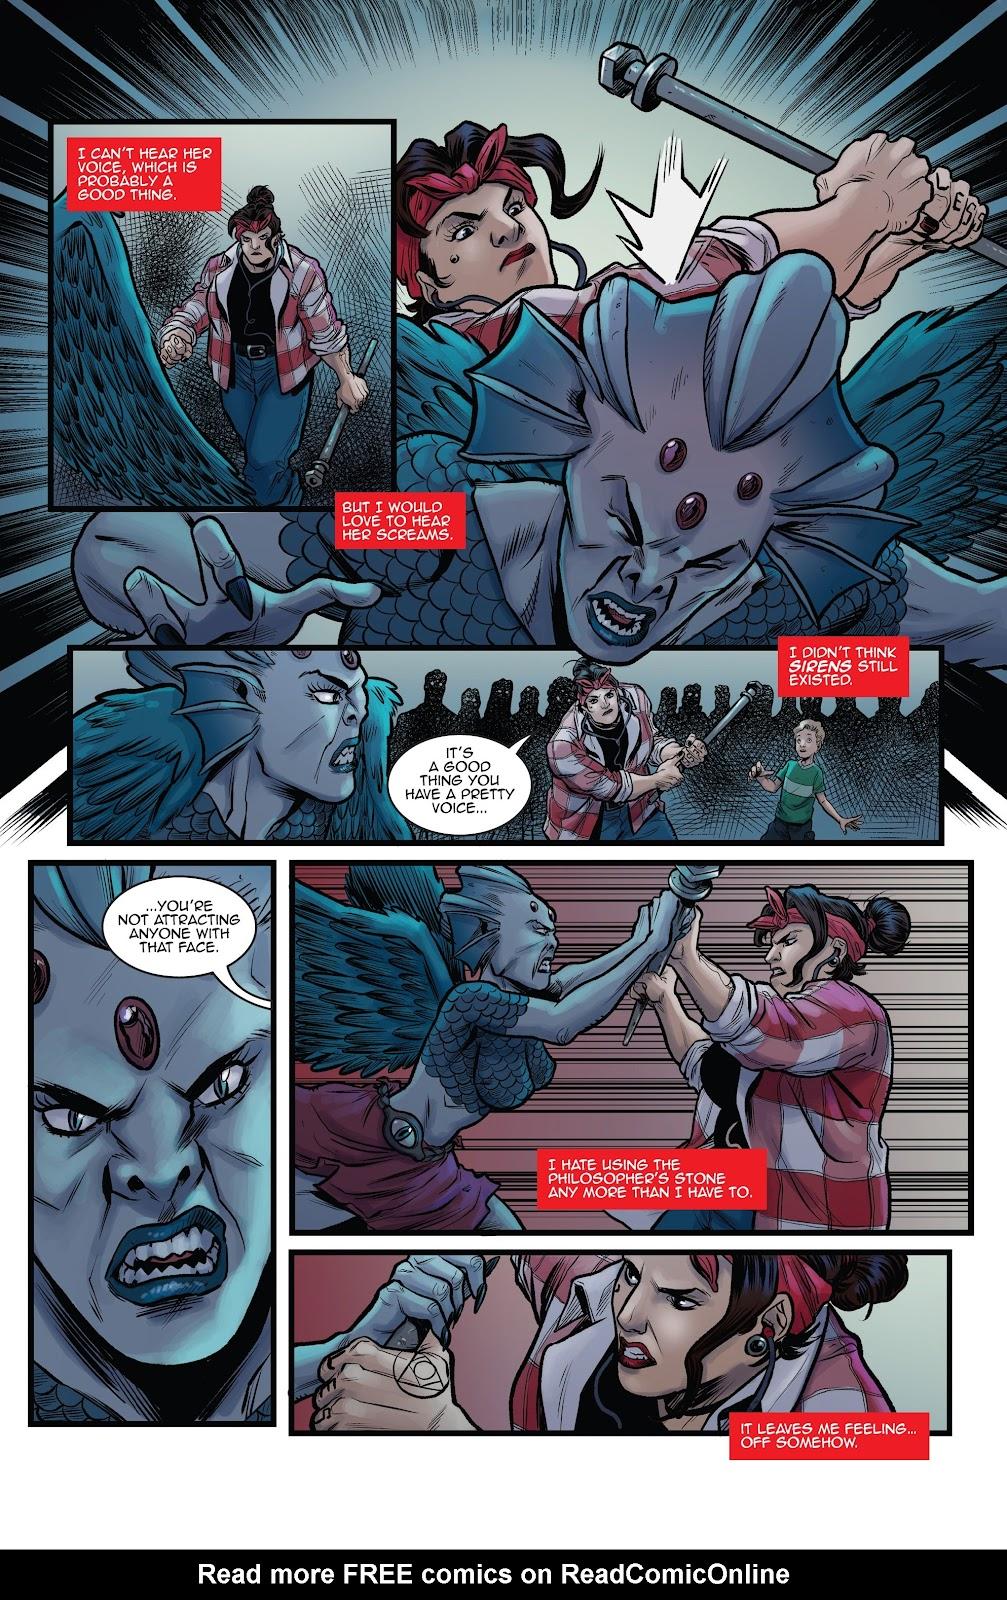 Read online Black Betty comic -  Issue #8 - 10